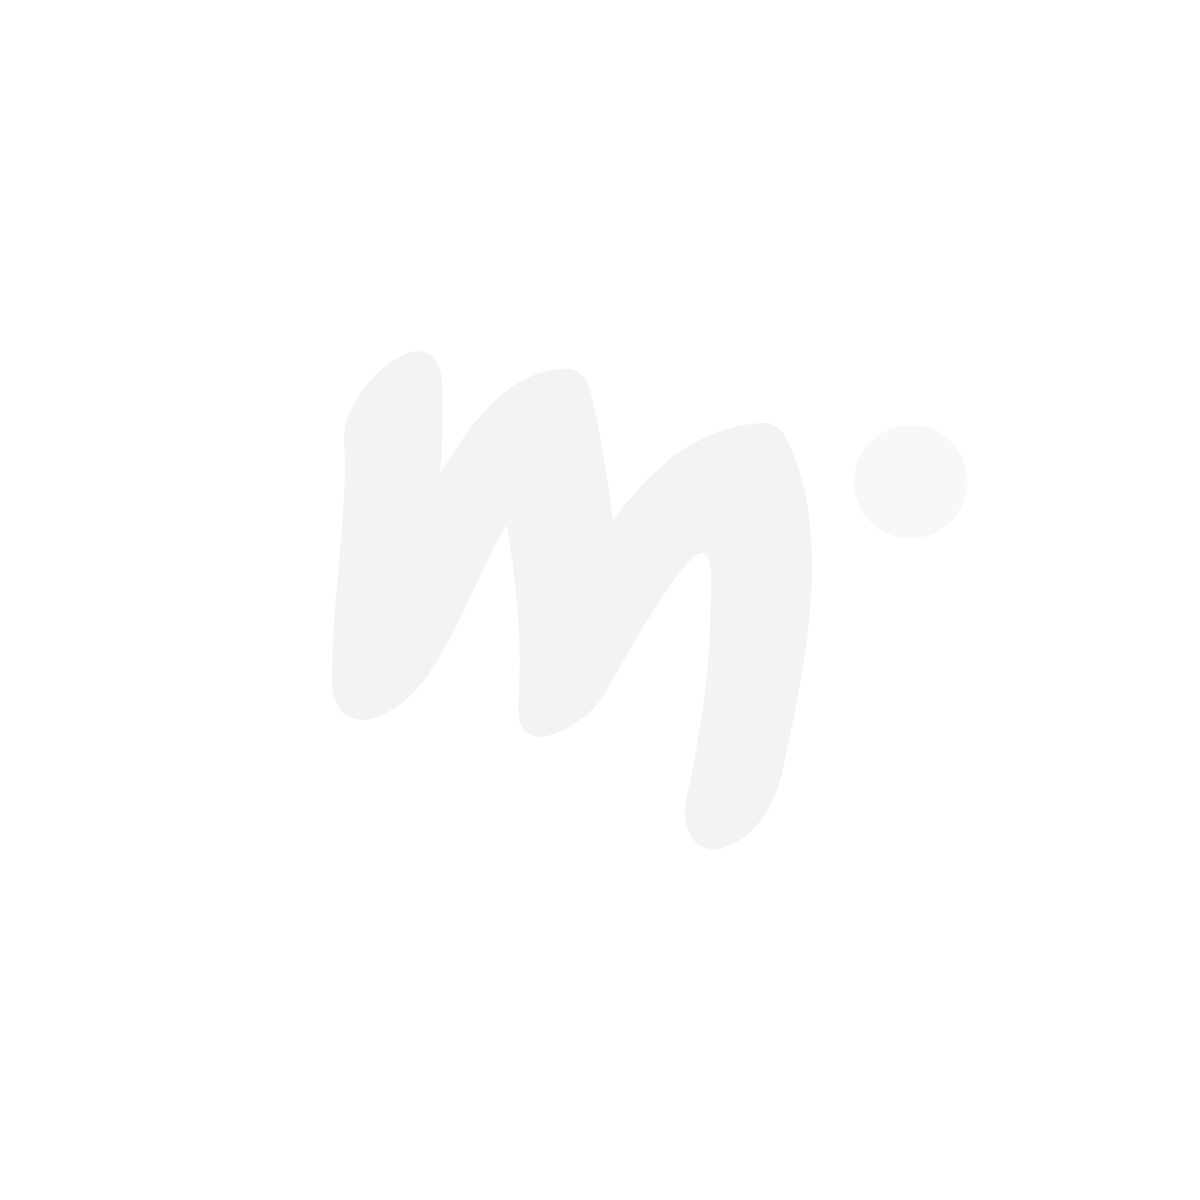 Mx Deco Luontotonttu 30 cm valkoinen